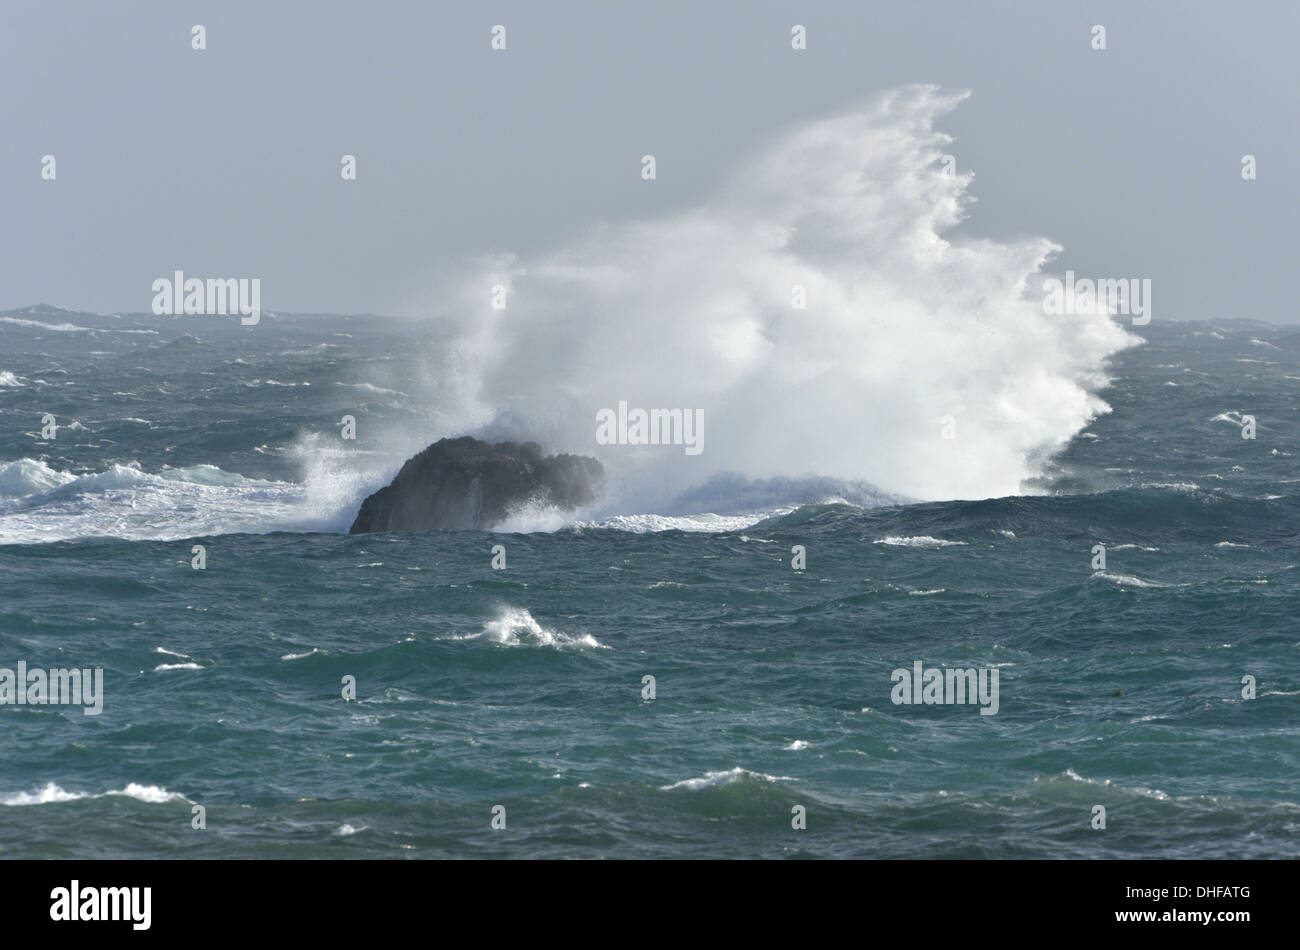 Rough sea on the British coast - Stock Image